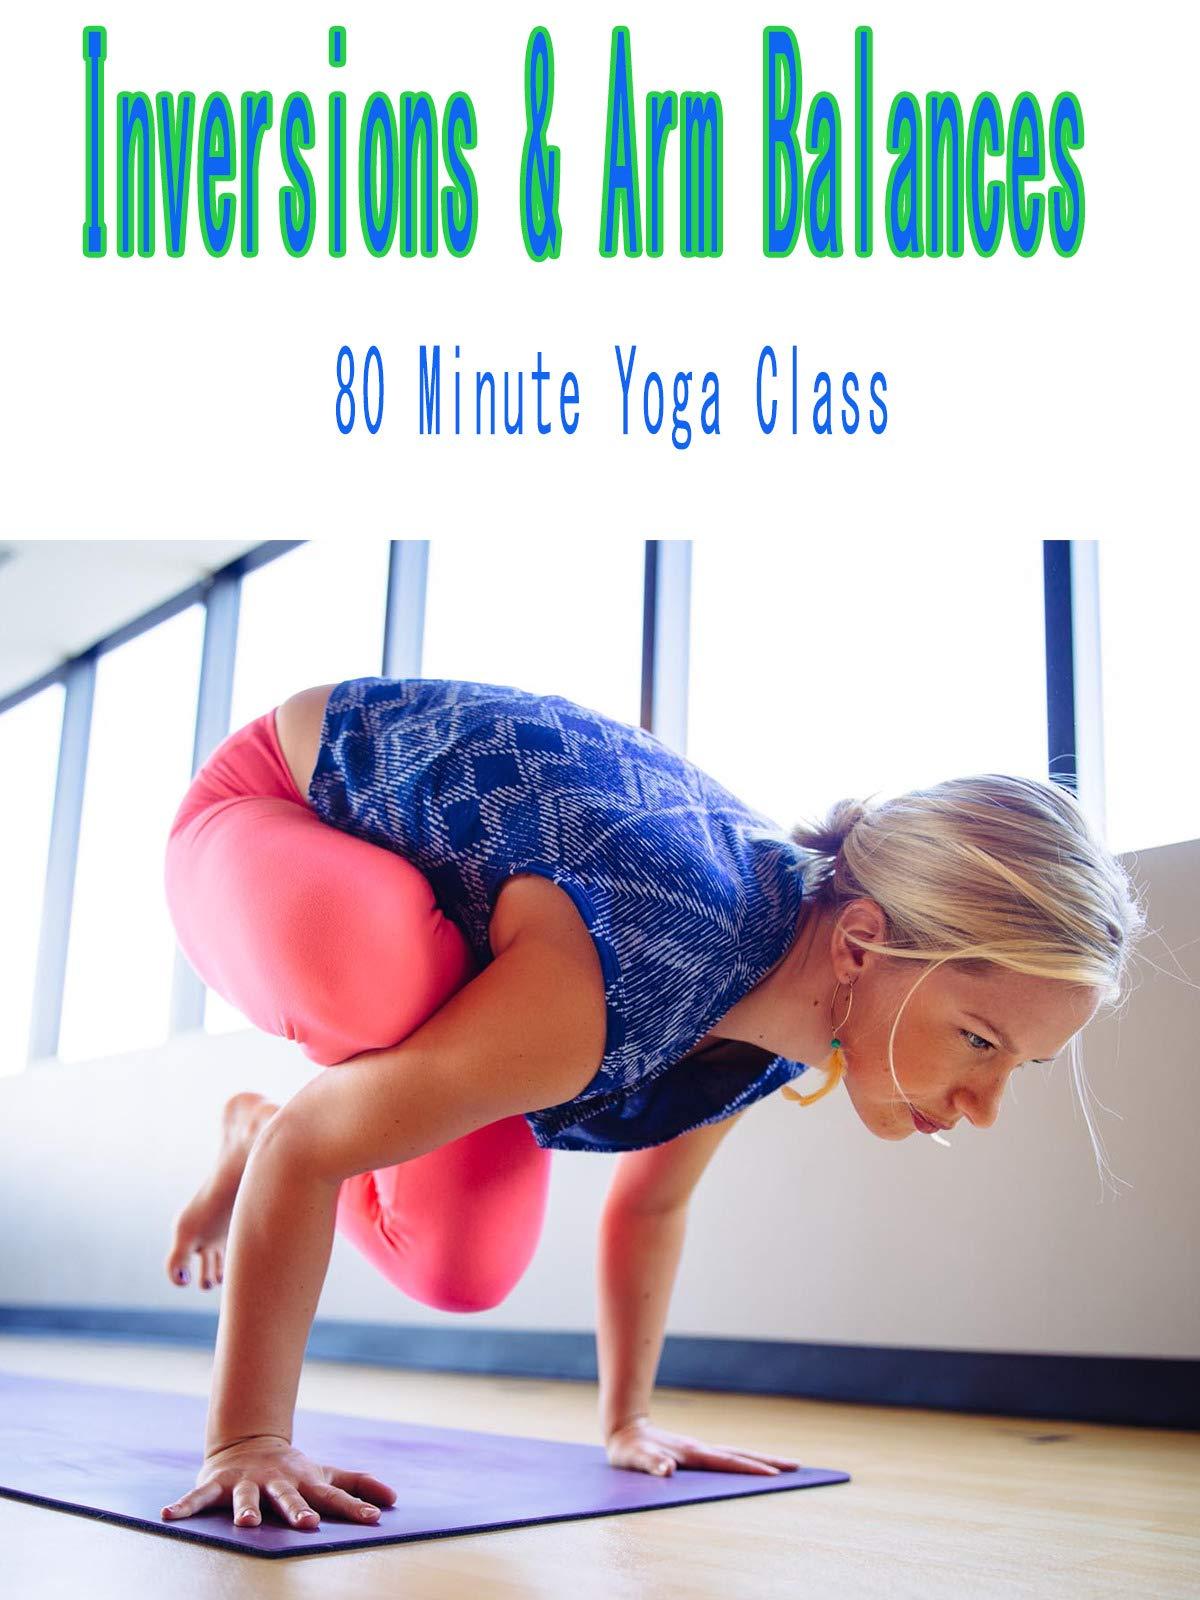 Watch 80 Minute Yoga Class - Inversions & Arm Balances ...